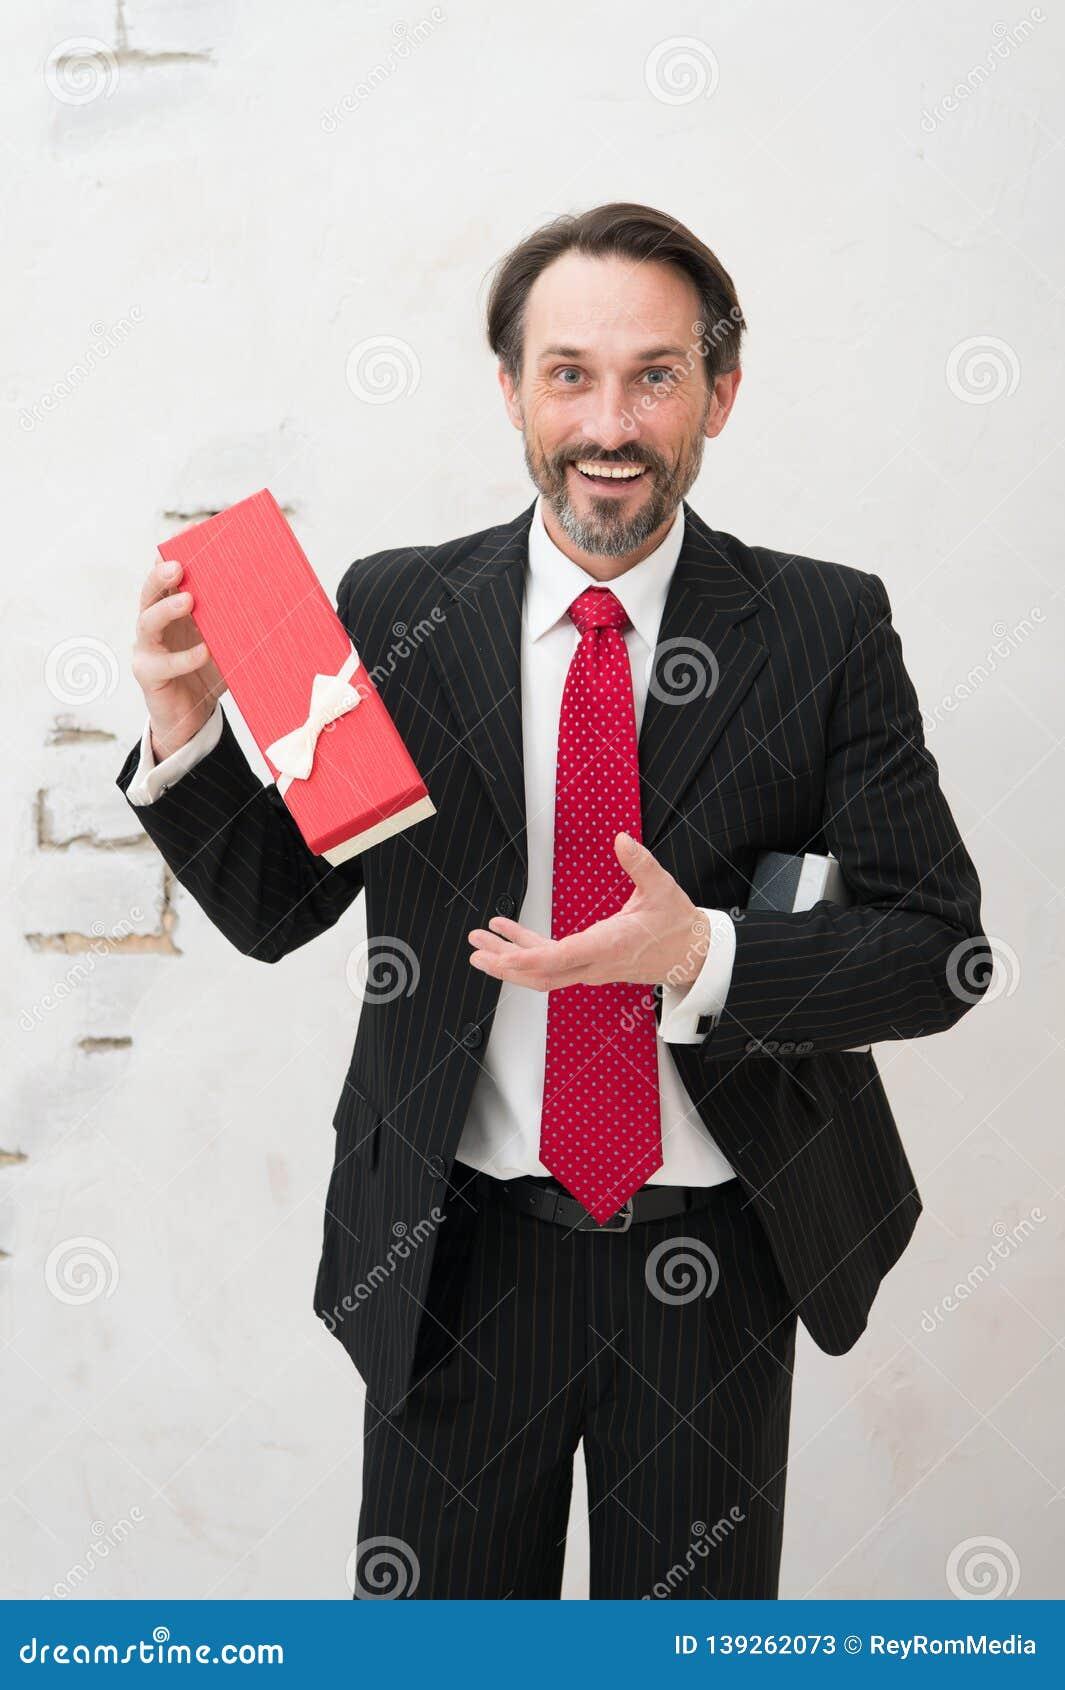 Excited mature man in classic suit holding elegant gift box